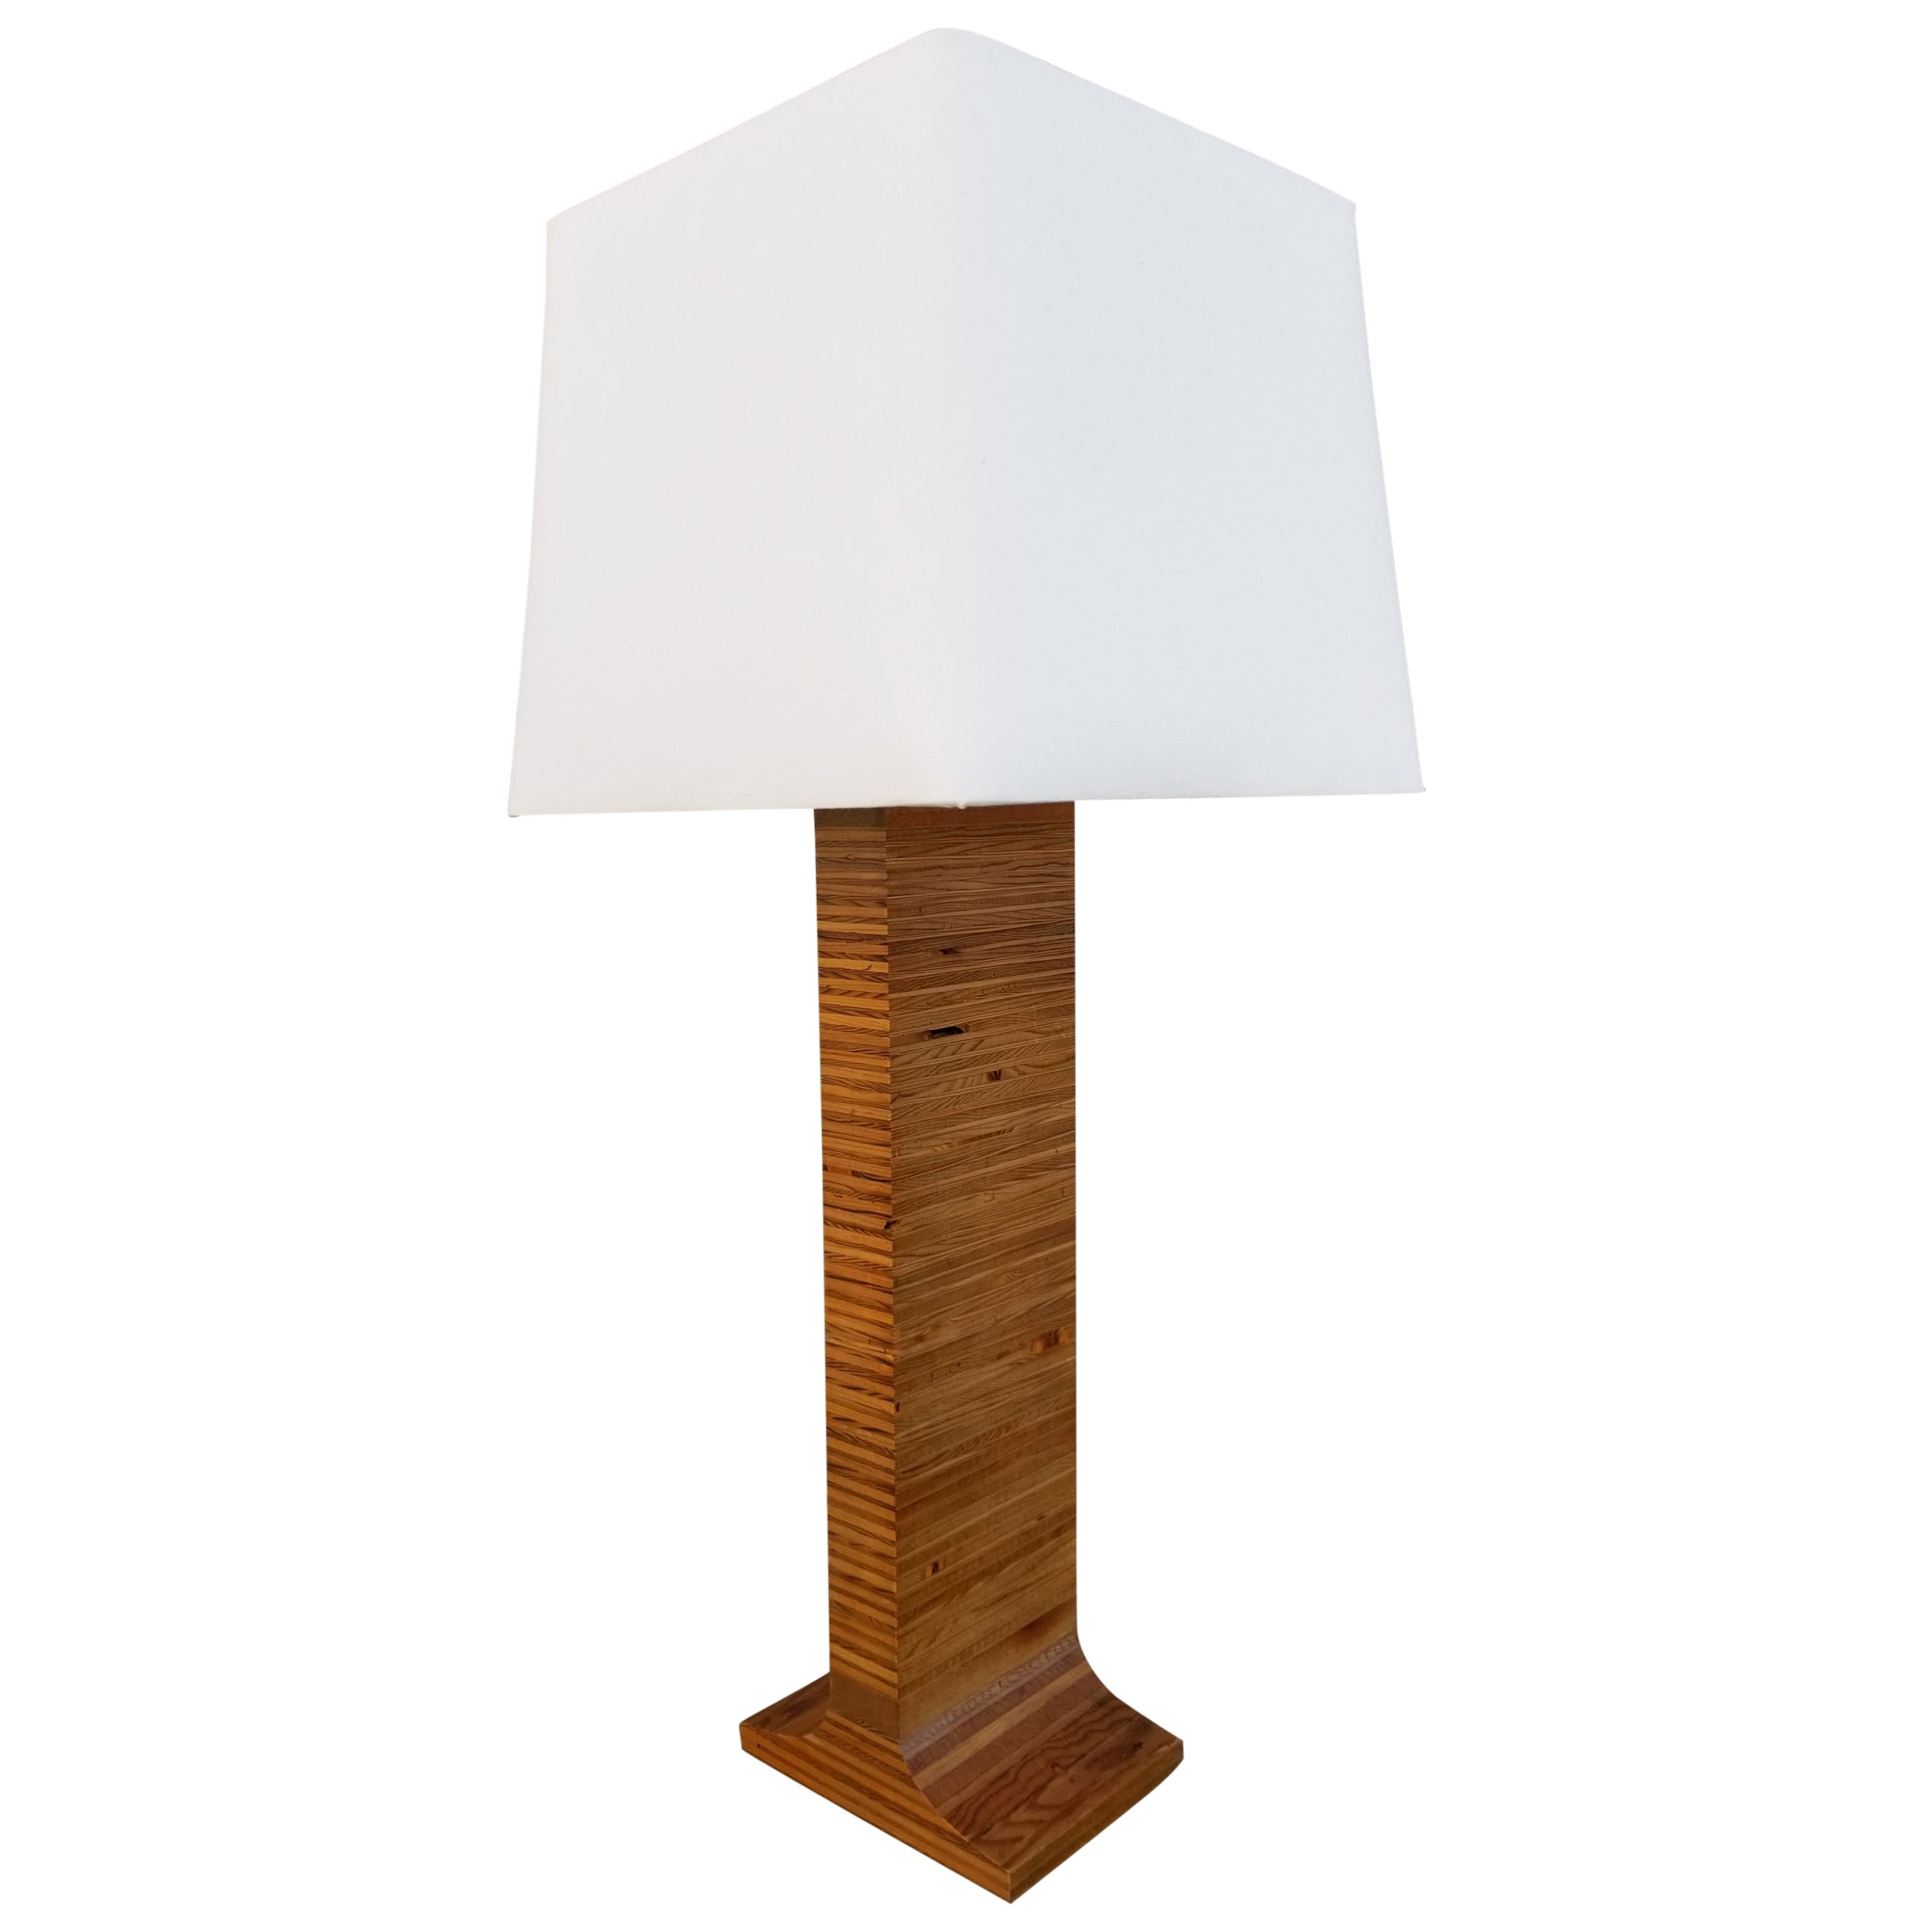 George Kovacs Organic Modern Table Lamp